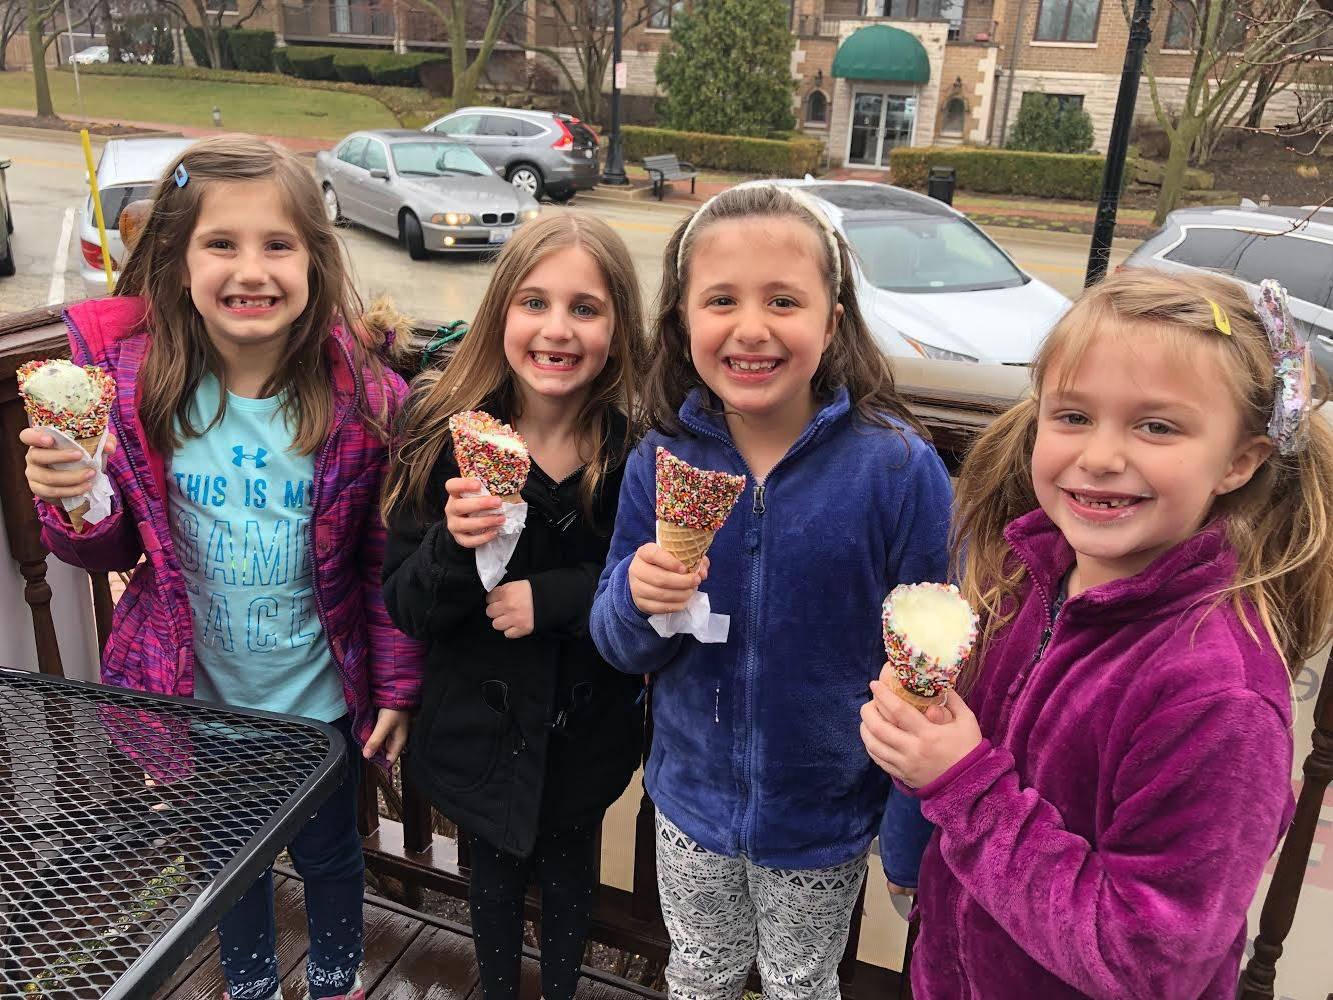 Capannari's Coolest School - 4/4/2019